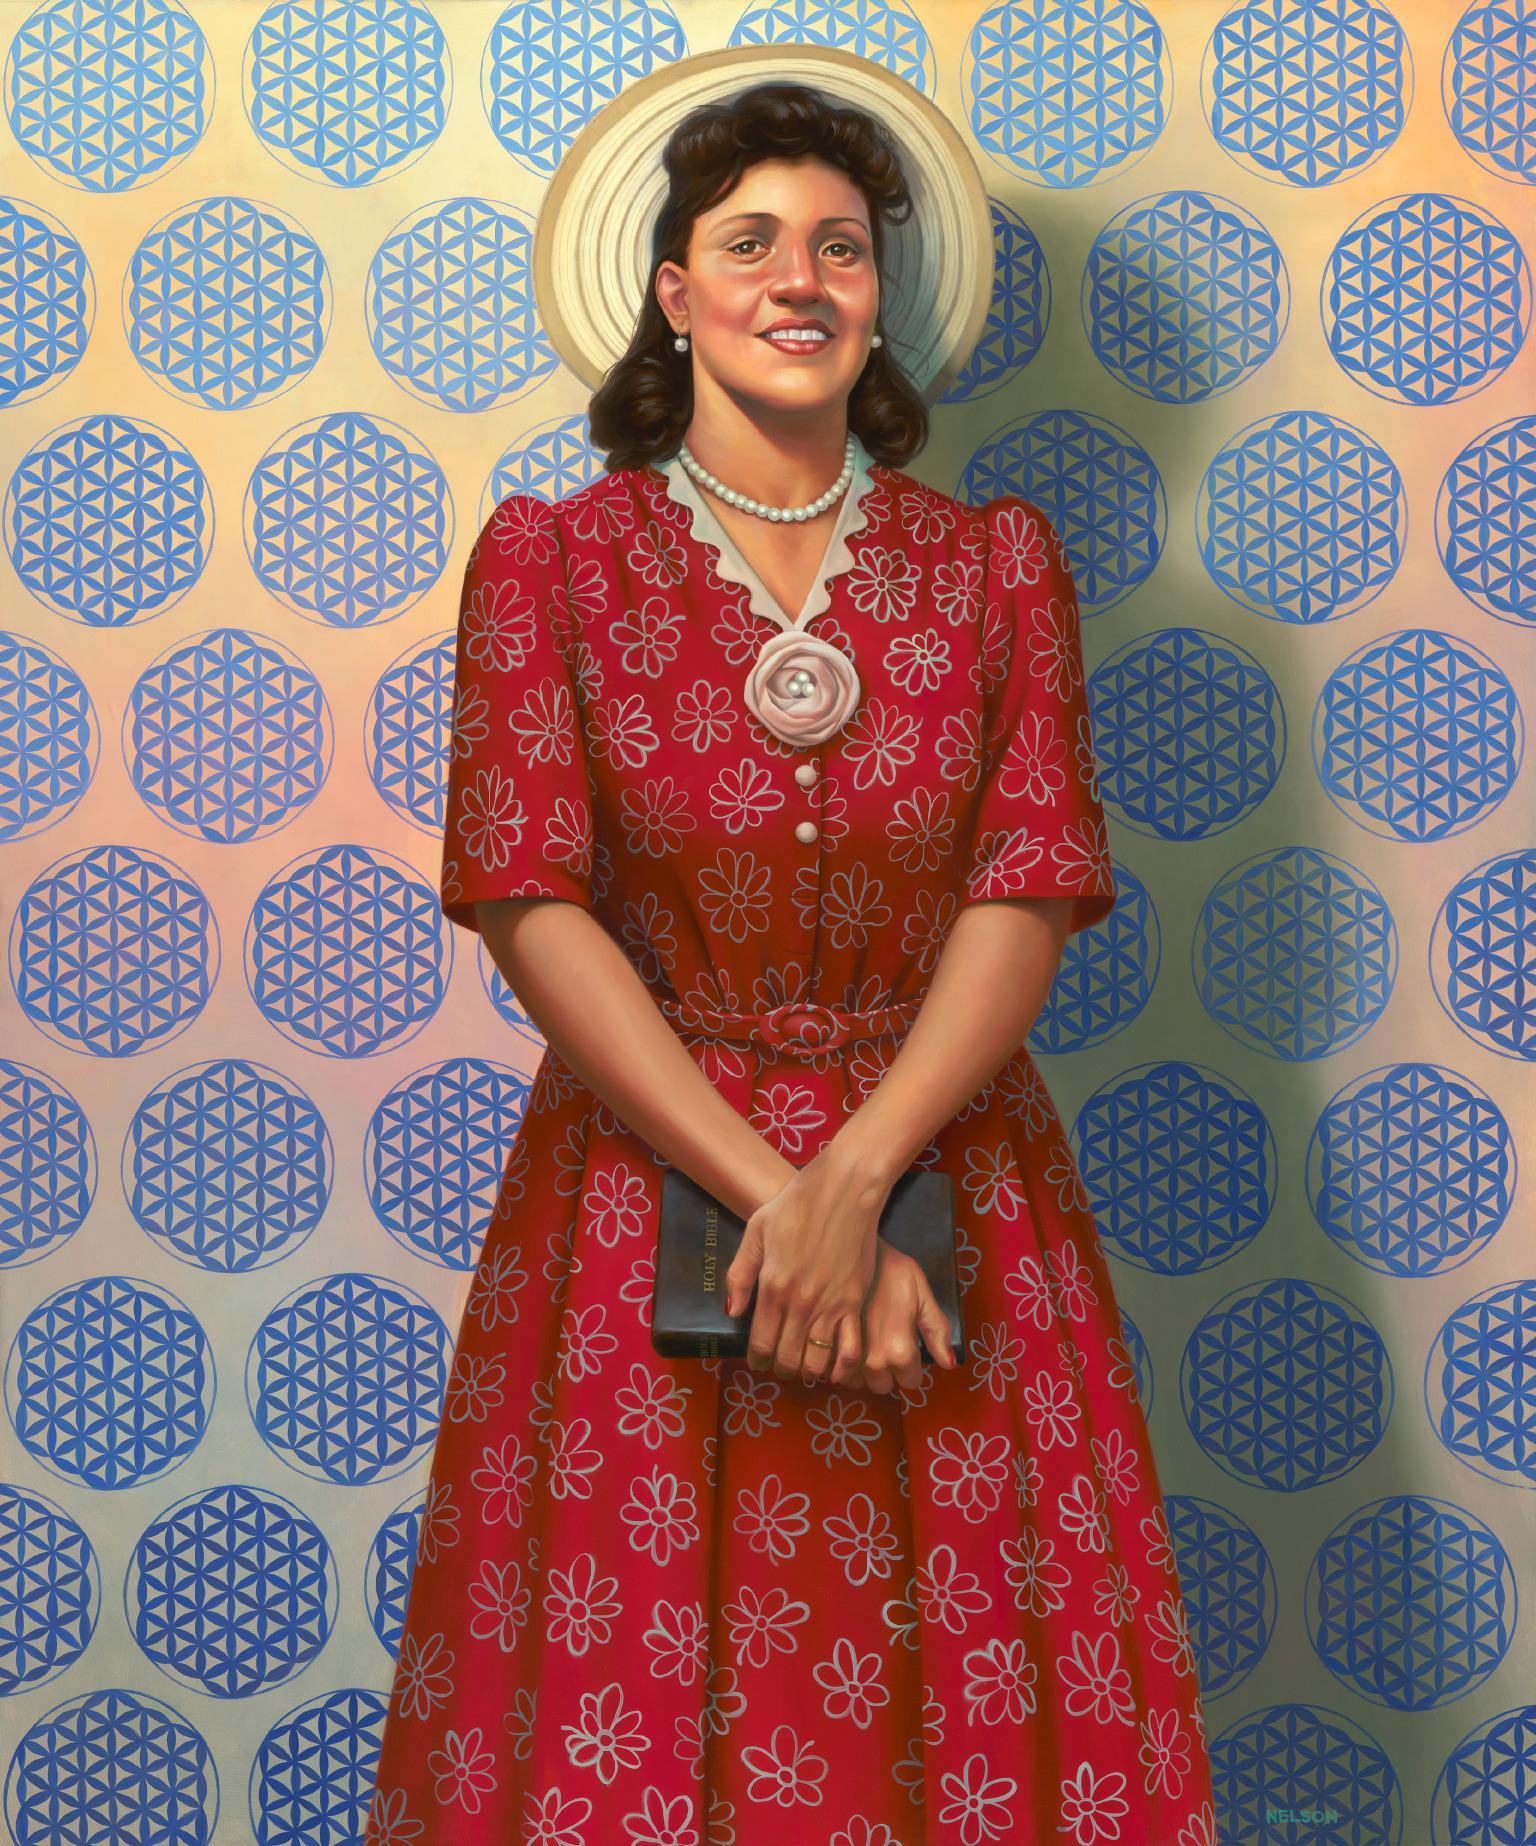 Henrietta Lacks by Kadir Nelson